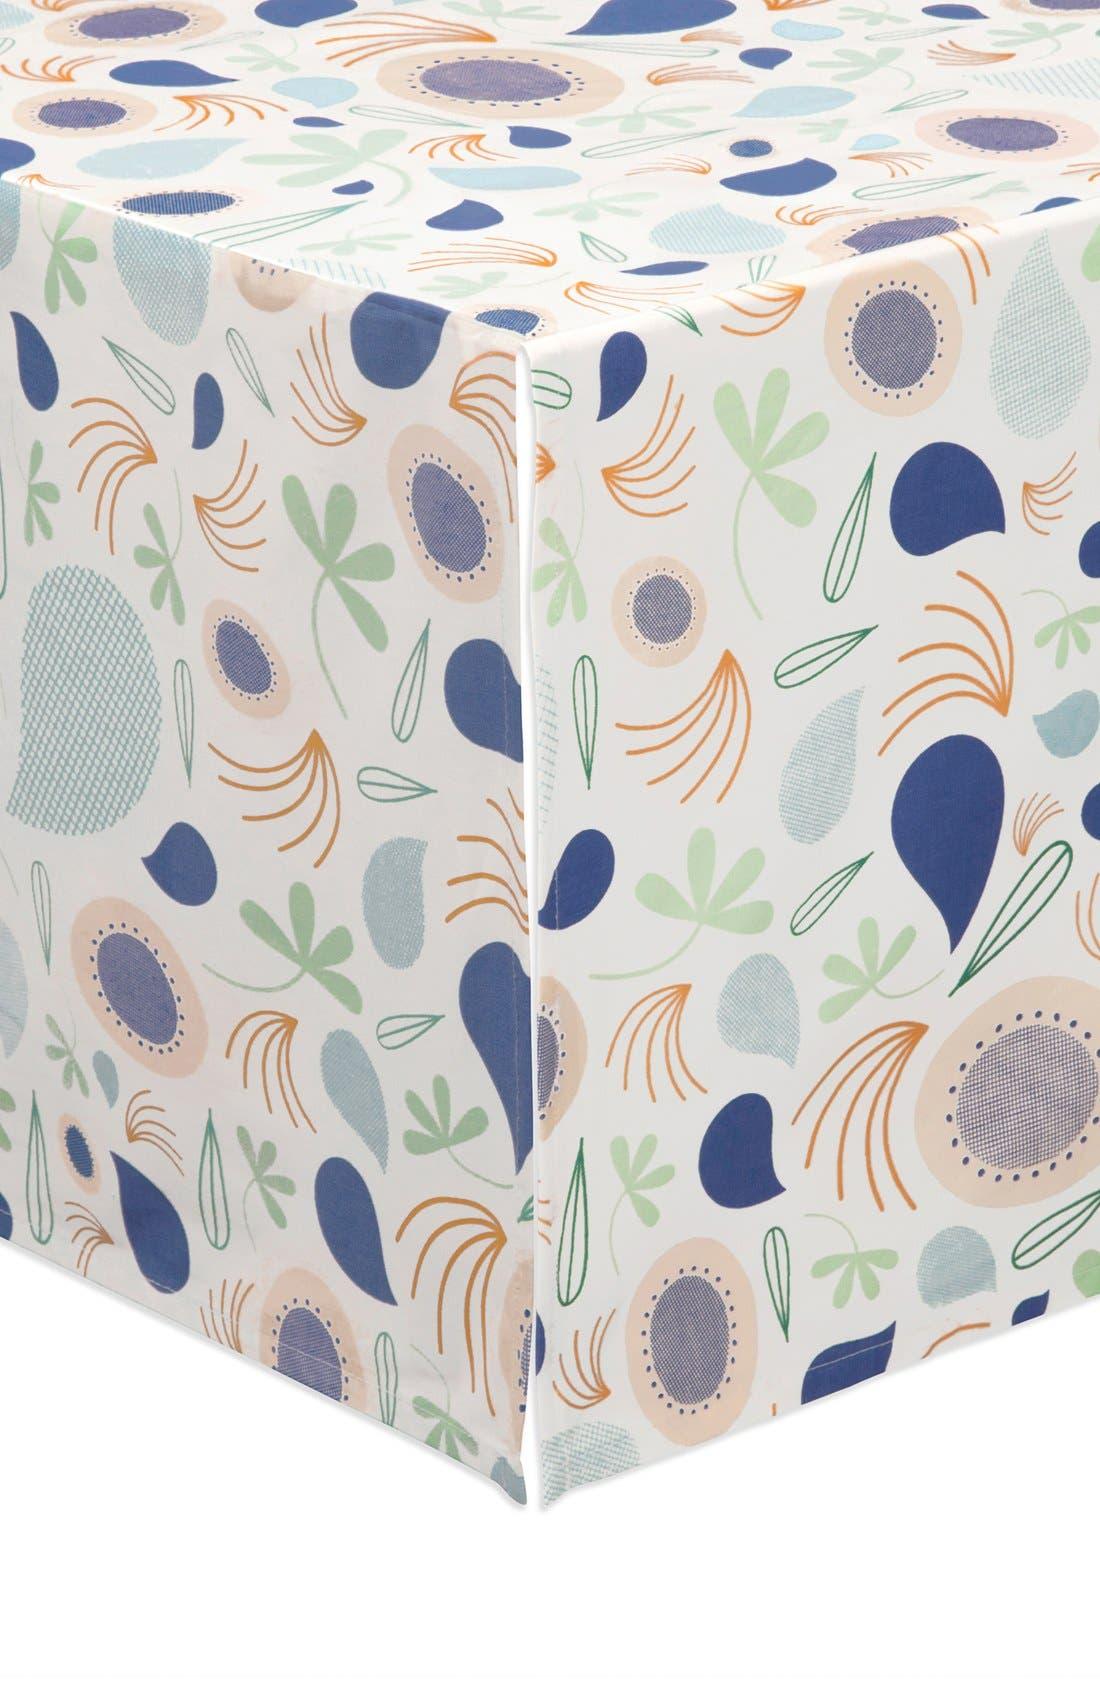 'Flora' Crib Sheet, Crib Skirt, Stroller Blanket & Wall Decals,                             Alternate thumbnail 4, color,                             Blue